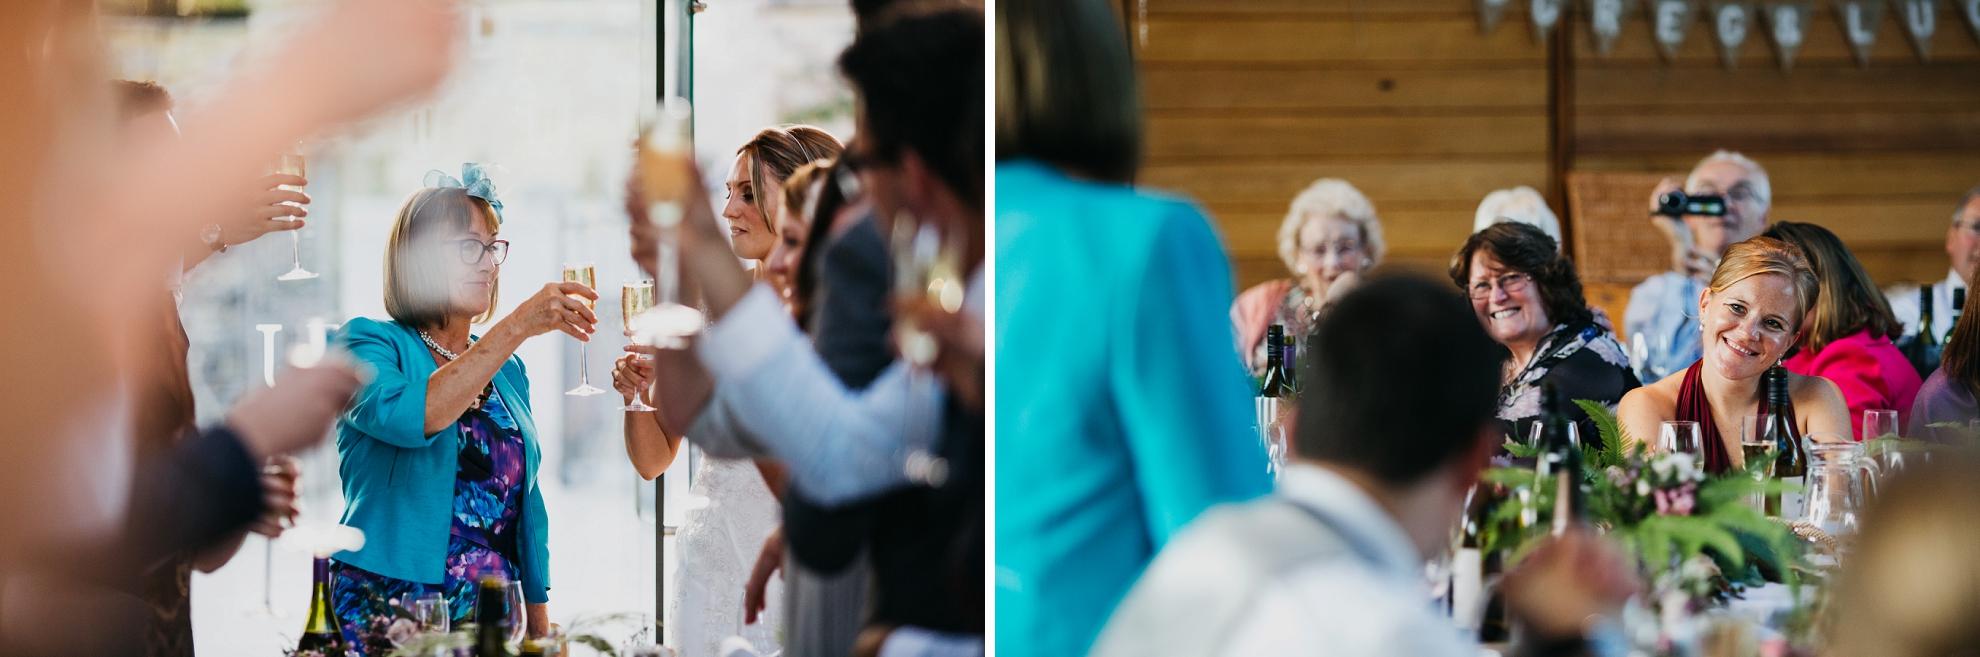 broughton-hall-wedding-photographer_062